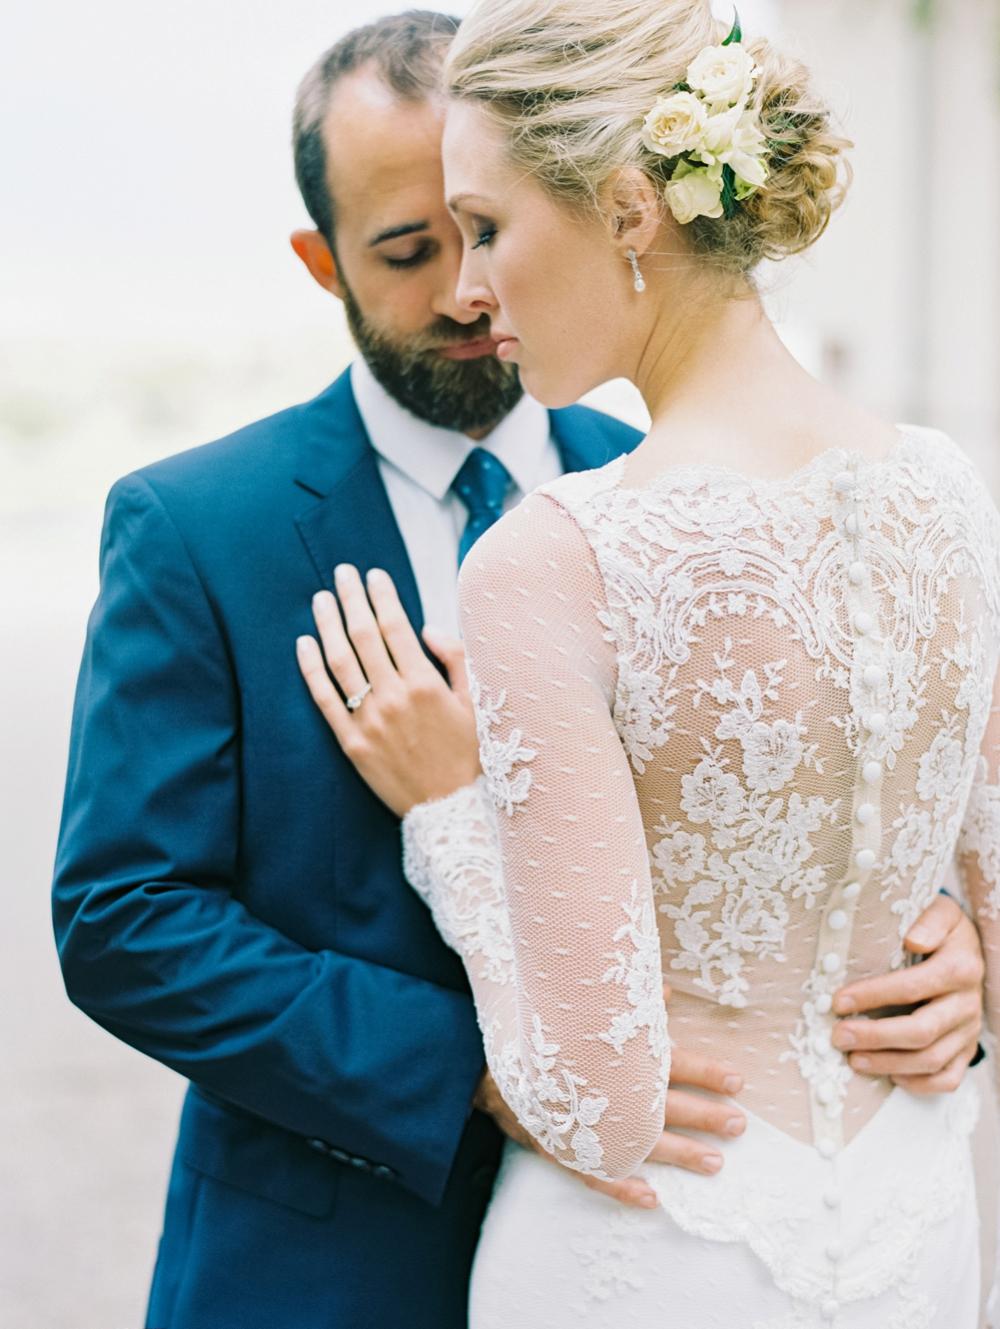 Lindsey Zamora Dallas Wedding Planner and Designer